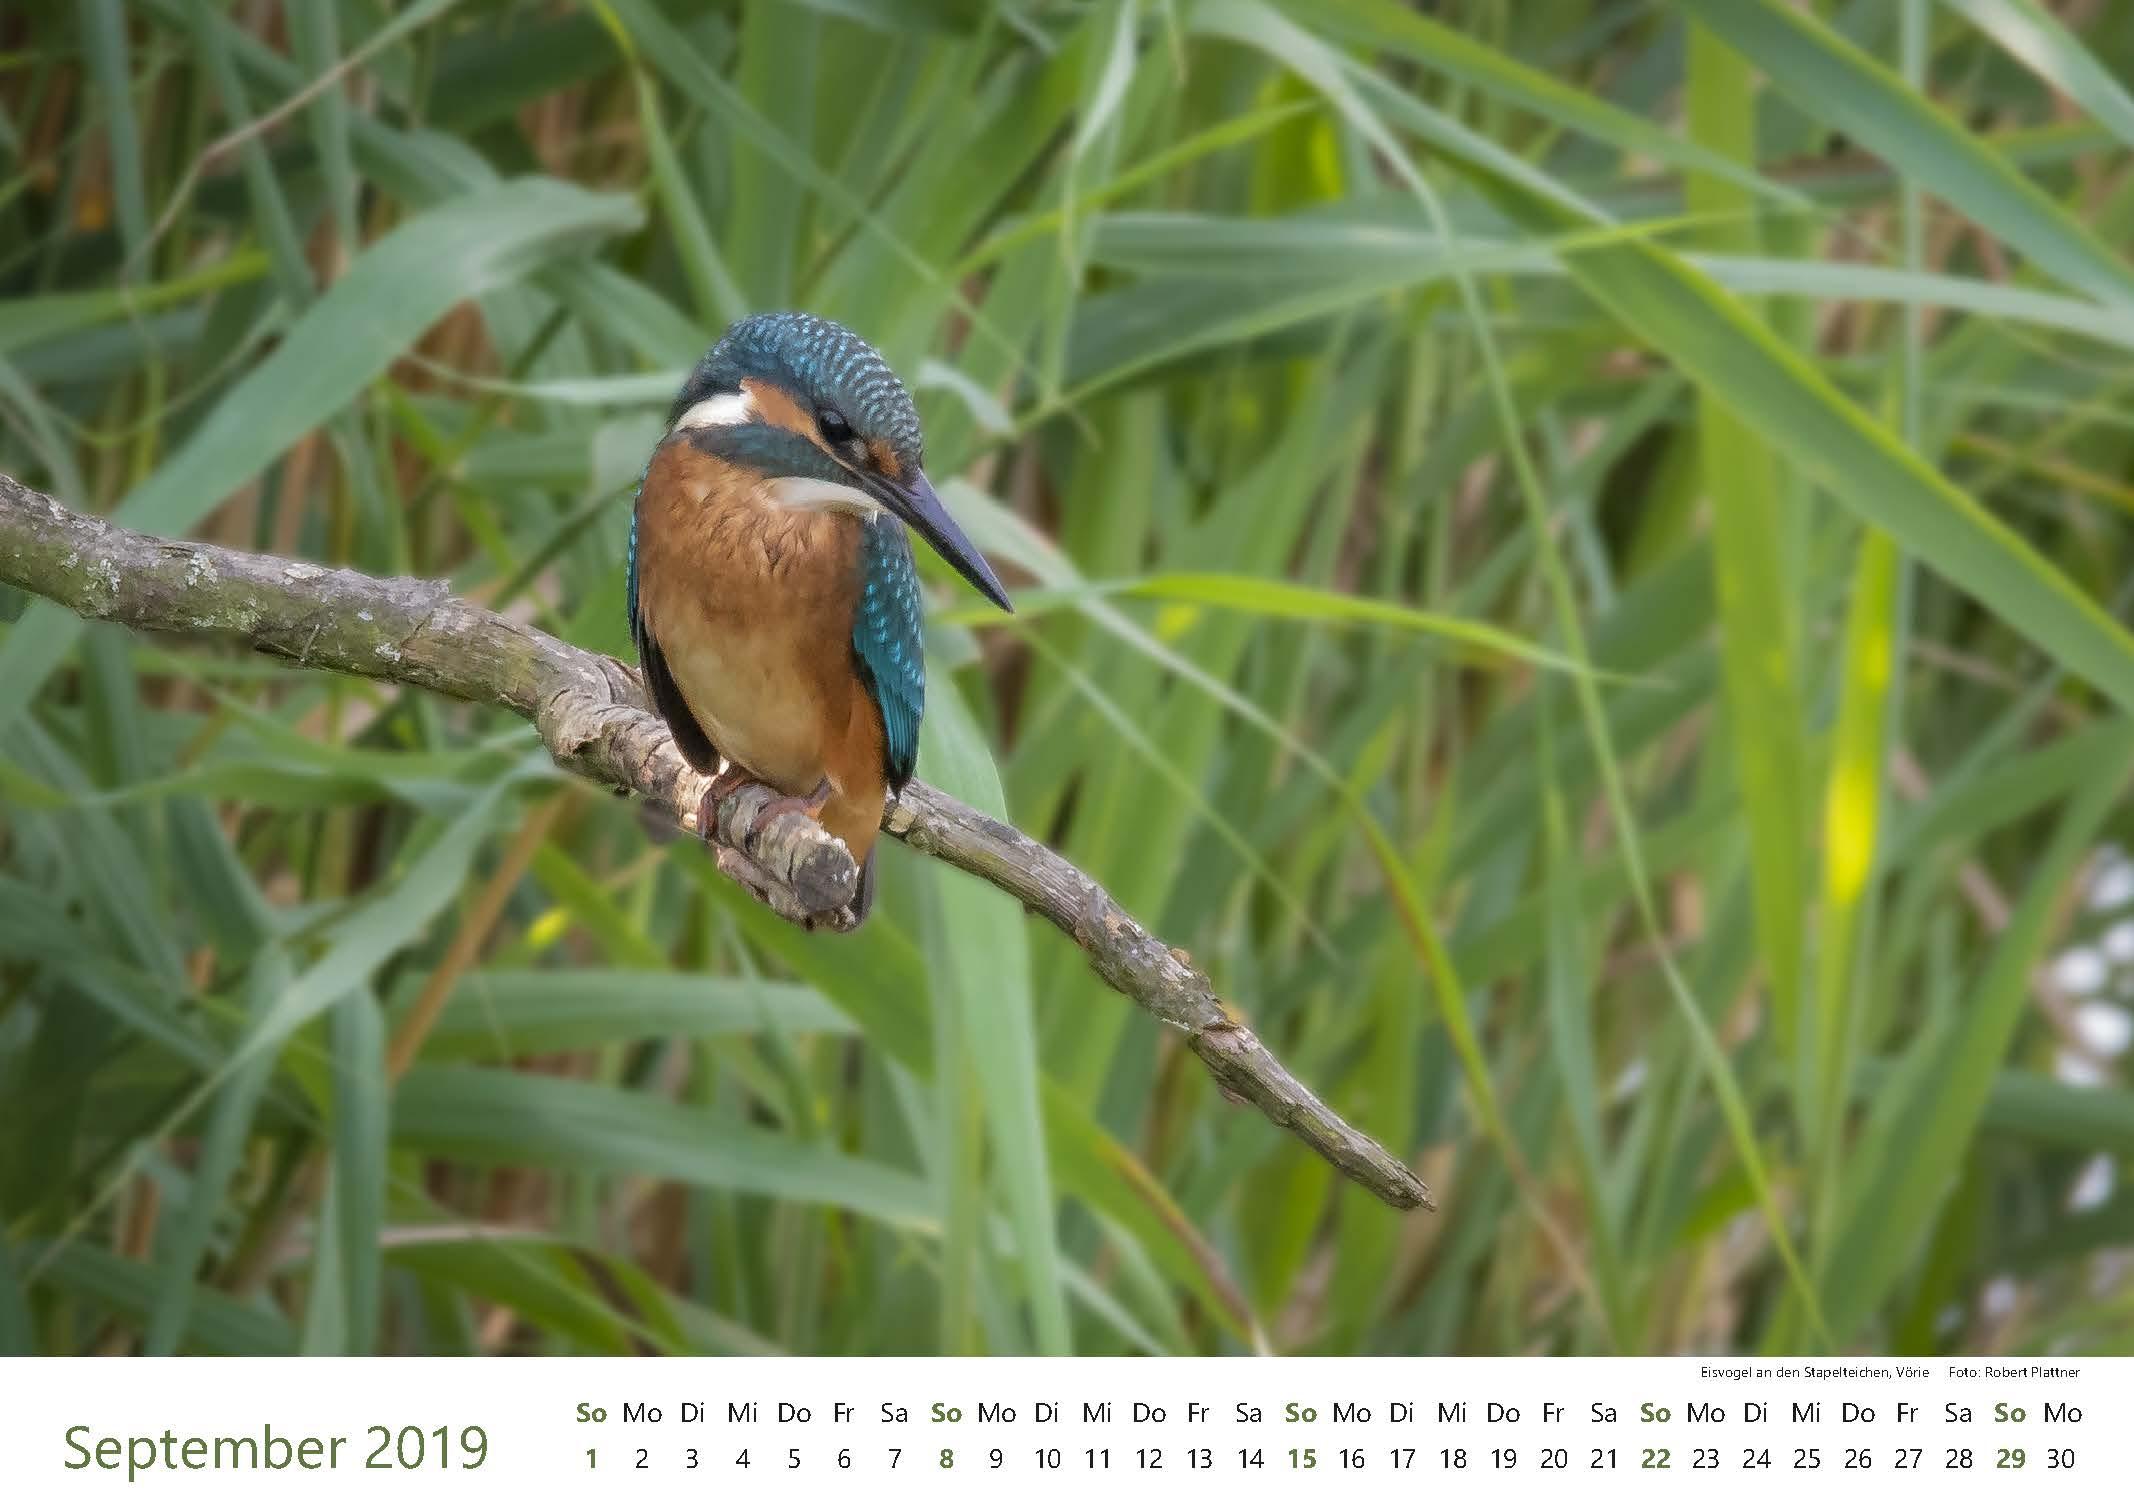 Kalender-2019-Zwischen-Ronnenberg-Deister- Robert-Plattner-Seite-09-September